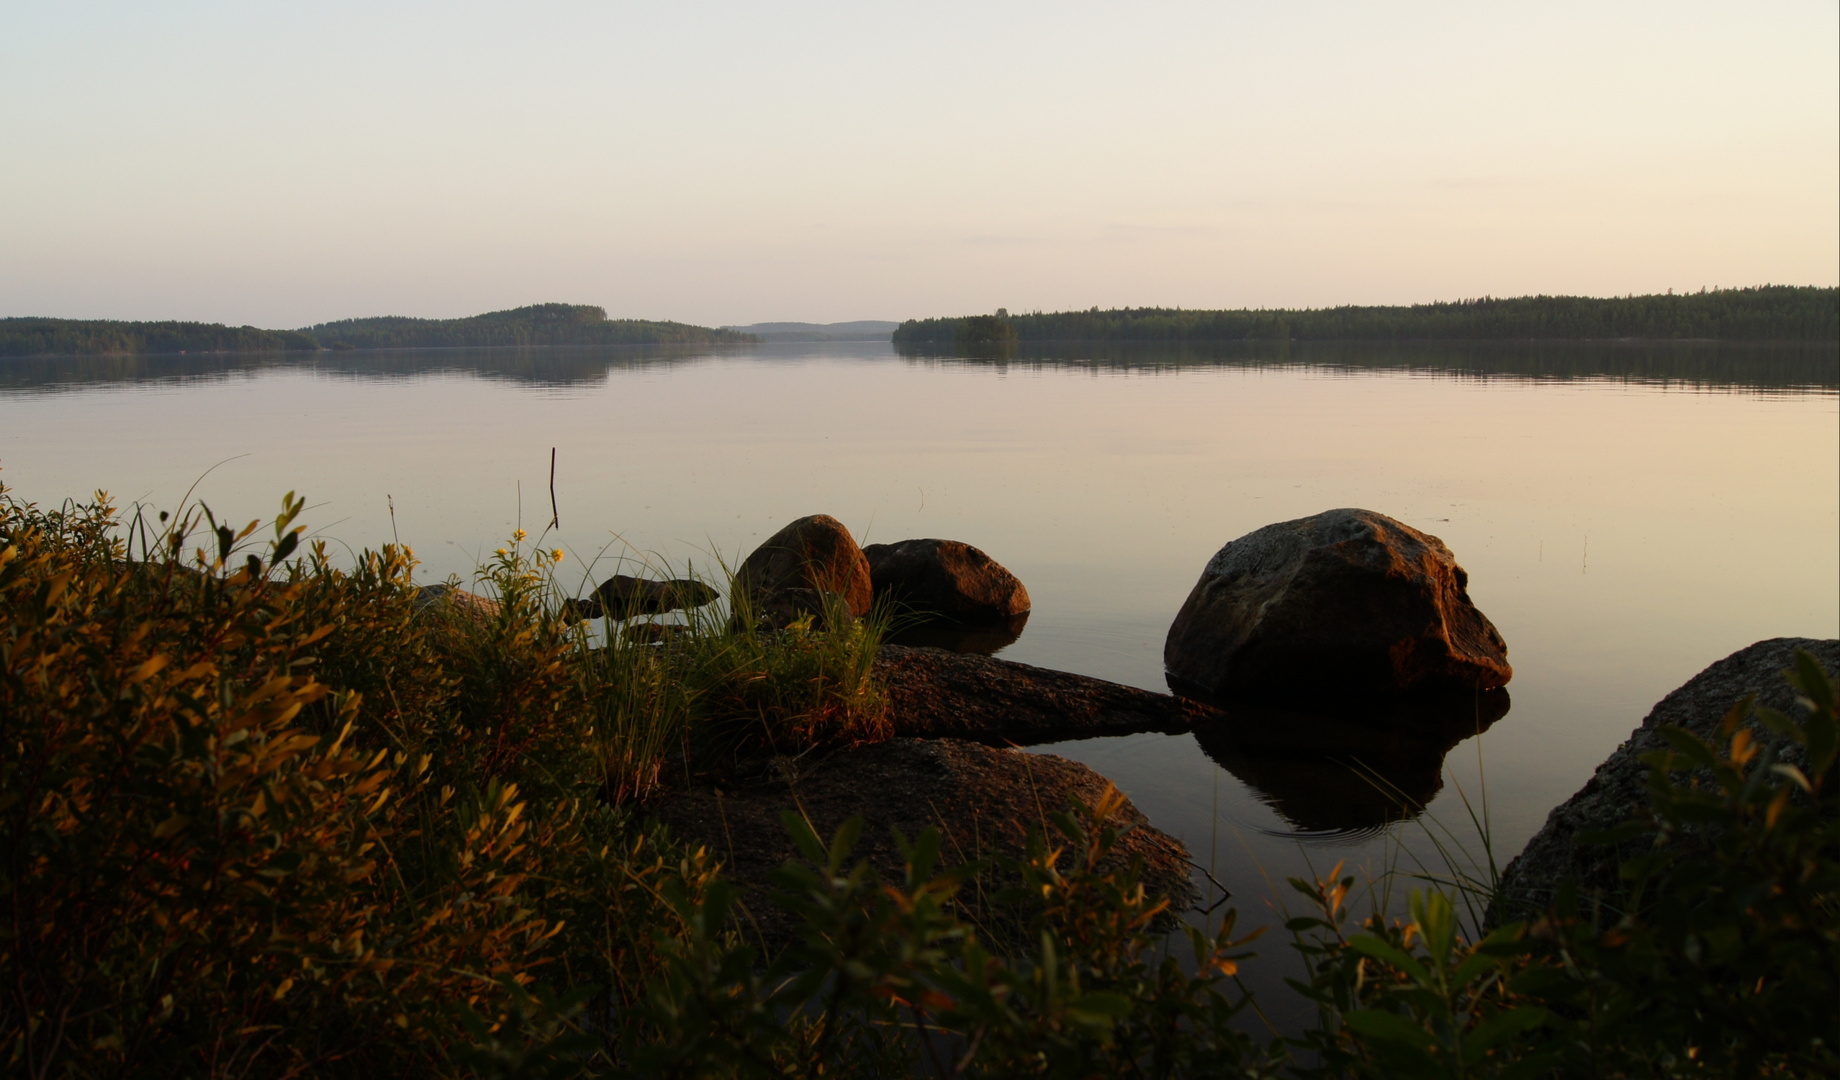 Abend am Puula-See in Hirvensalmi/Finnland